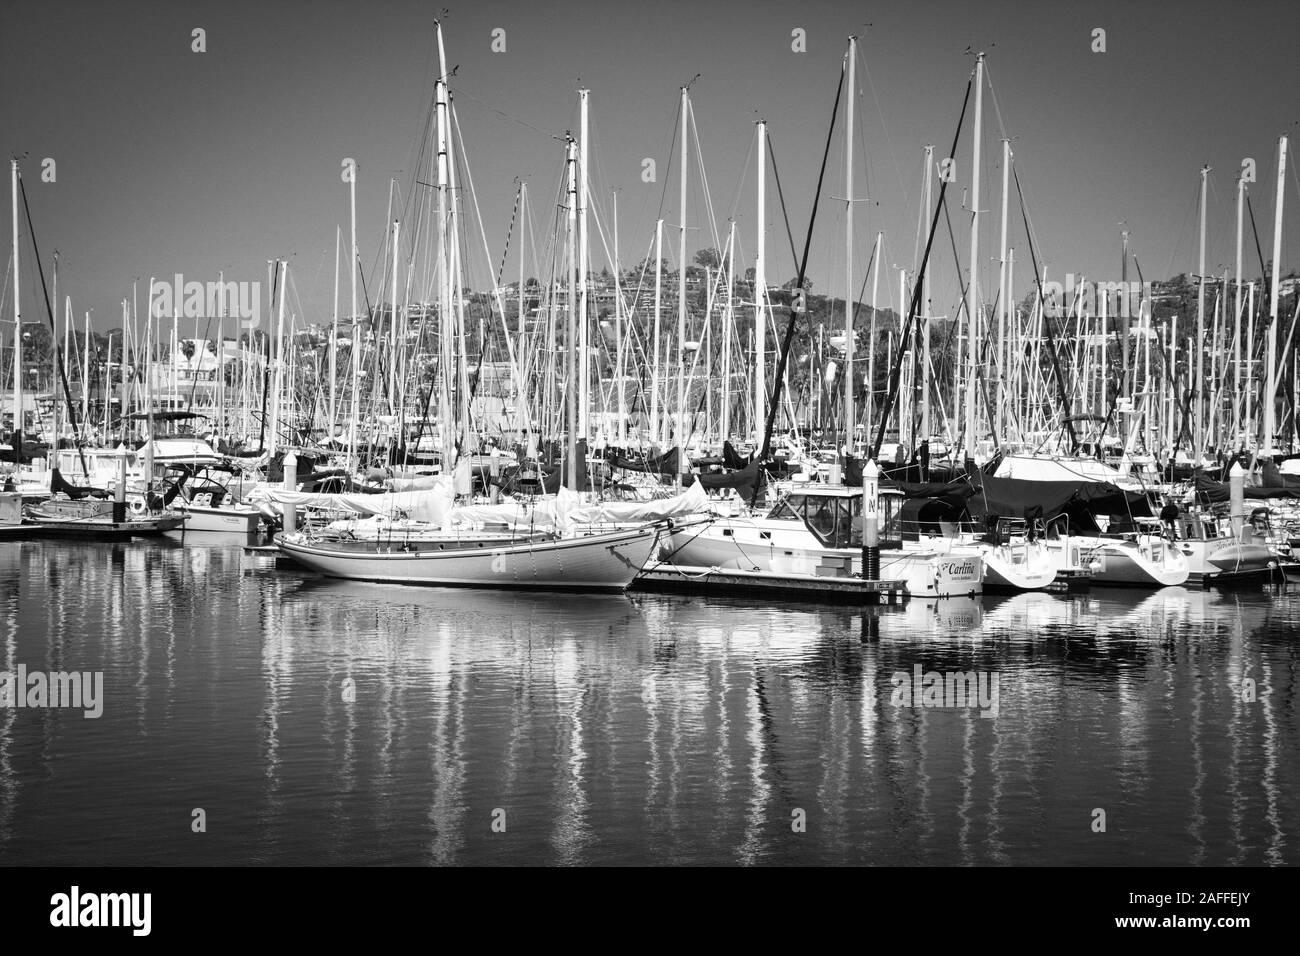 A picturesque view of moored sailboats against the backdrop of the Santa Ynez Mountains at the Santa Barbara Harbor, Santa Barbara, CA, USA Stock Photo